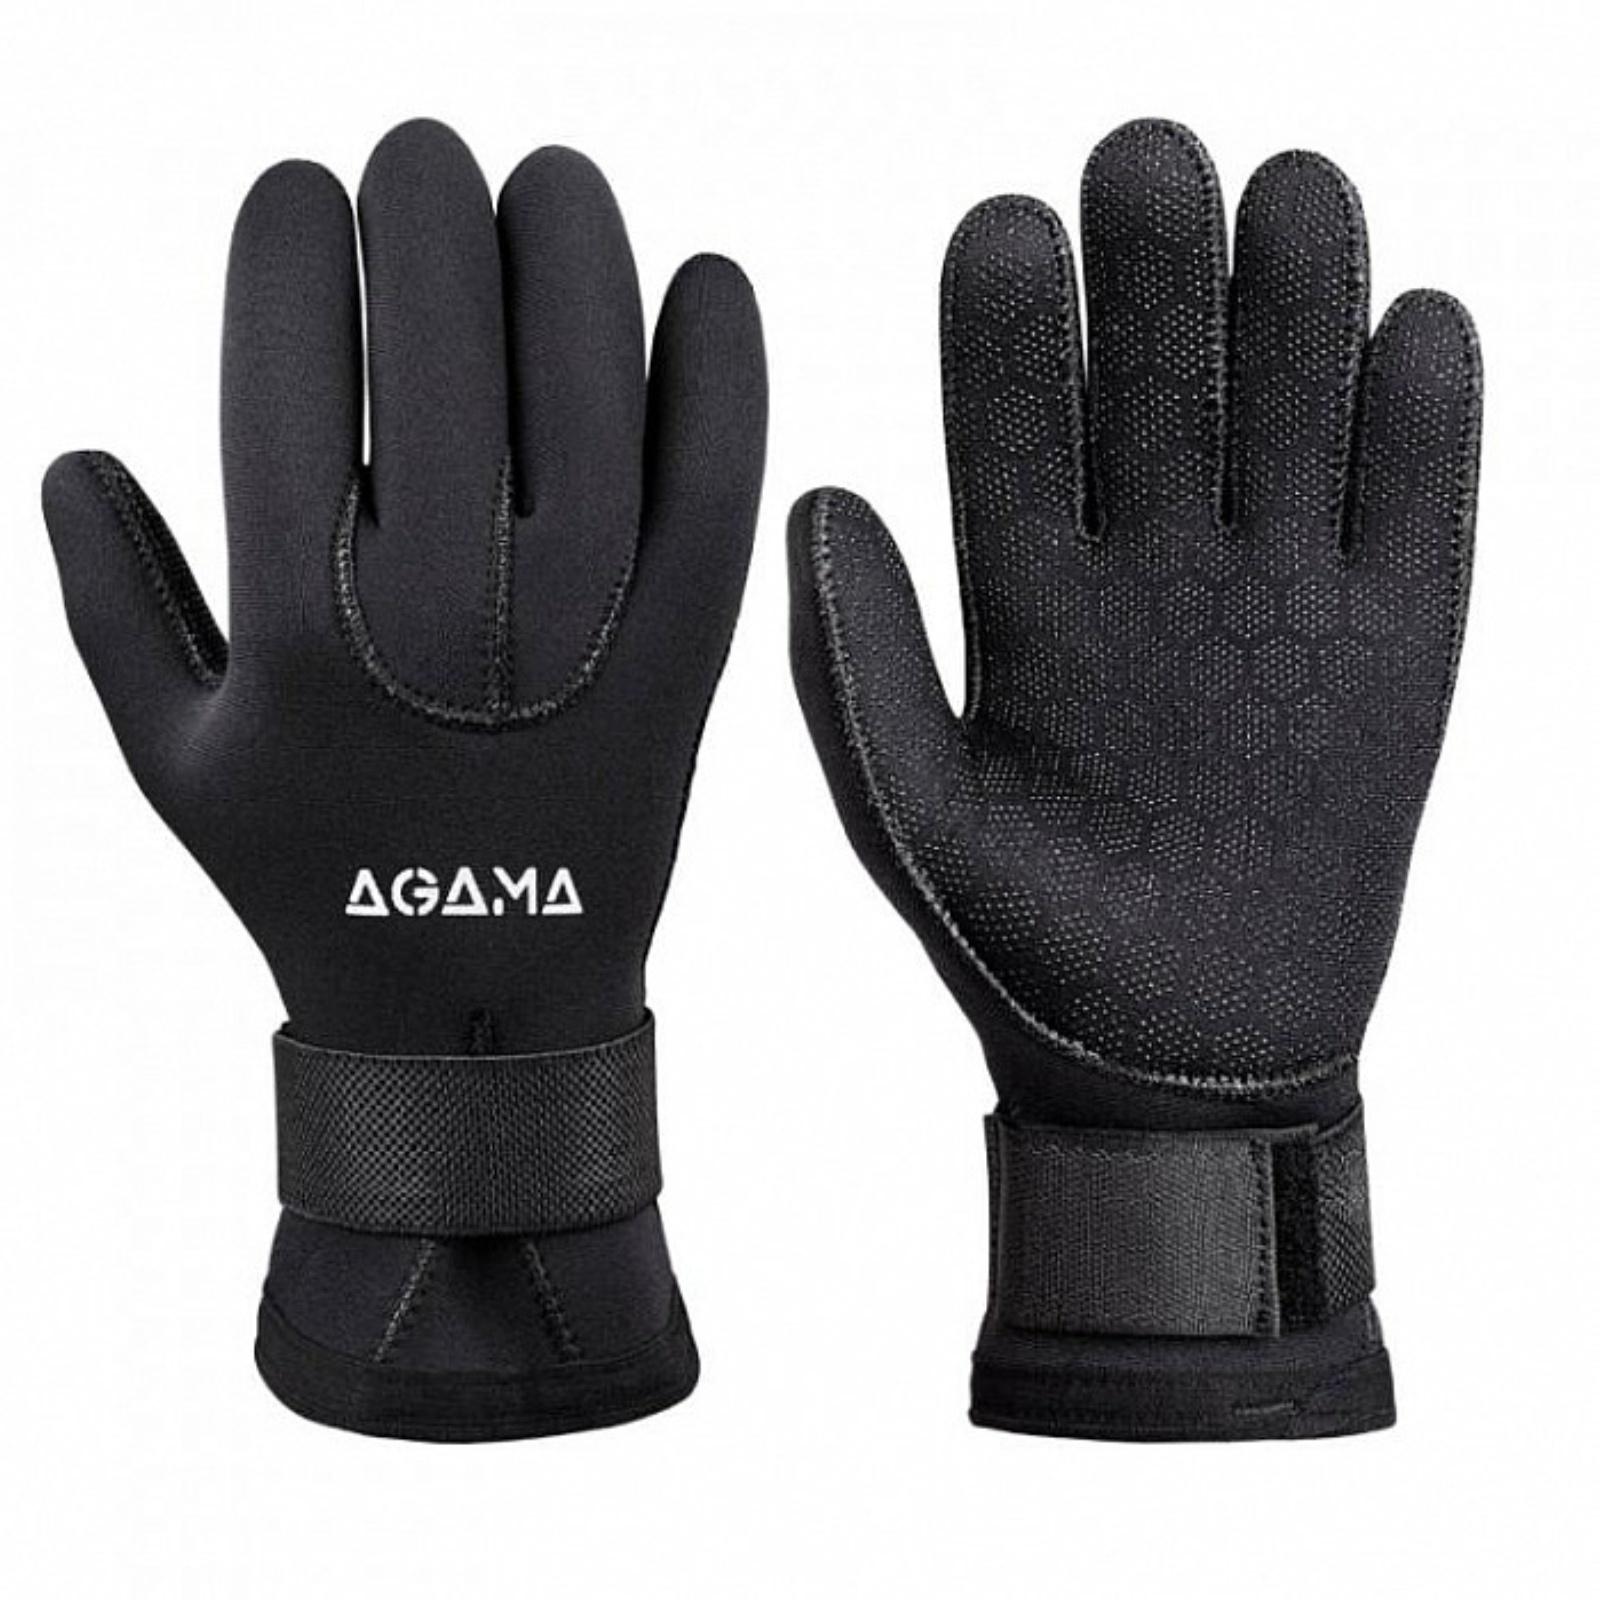 Neoprenové rukavice AGAMA Classic 5 mm - vel. M